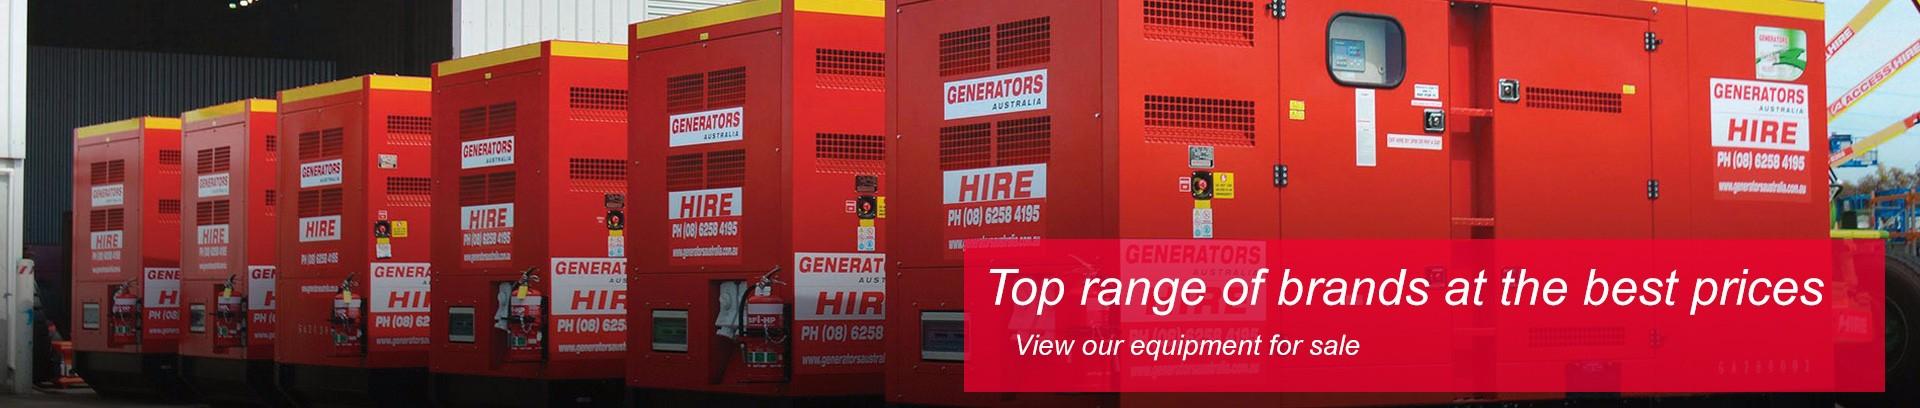 01-generators-australia-image-sales